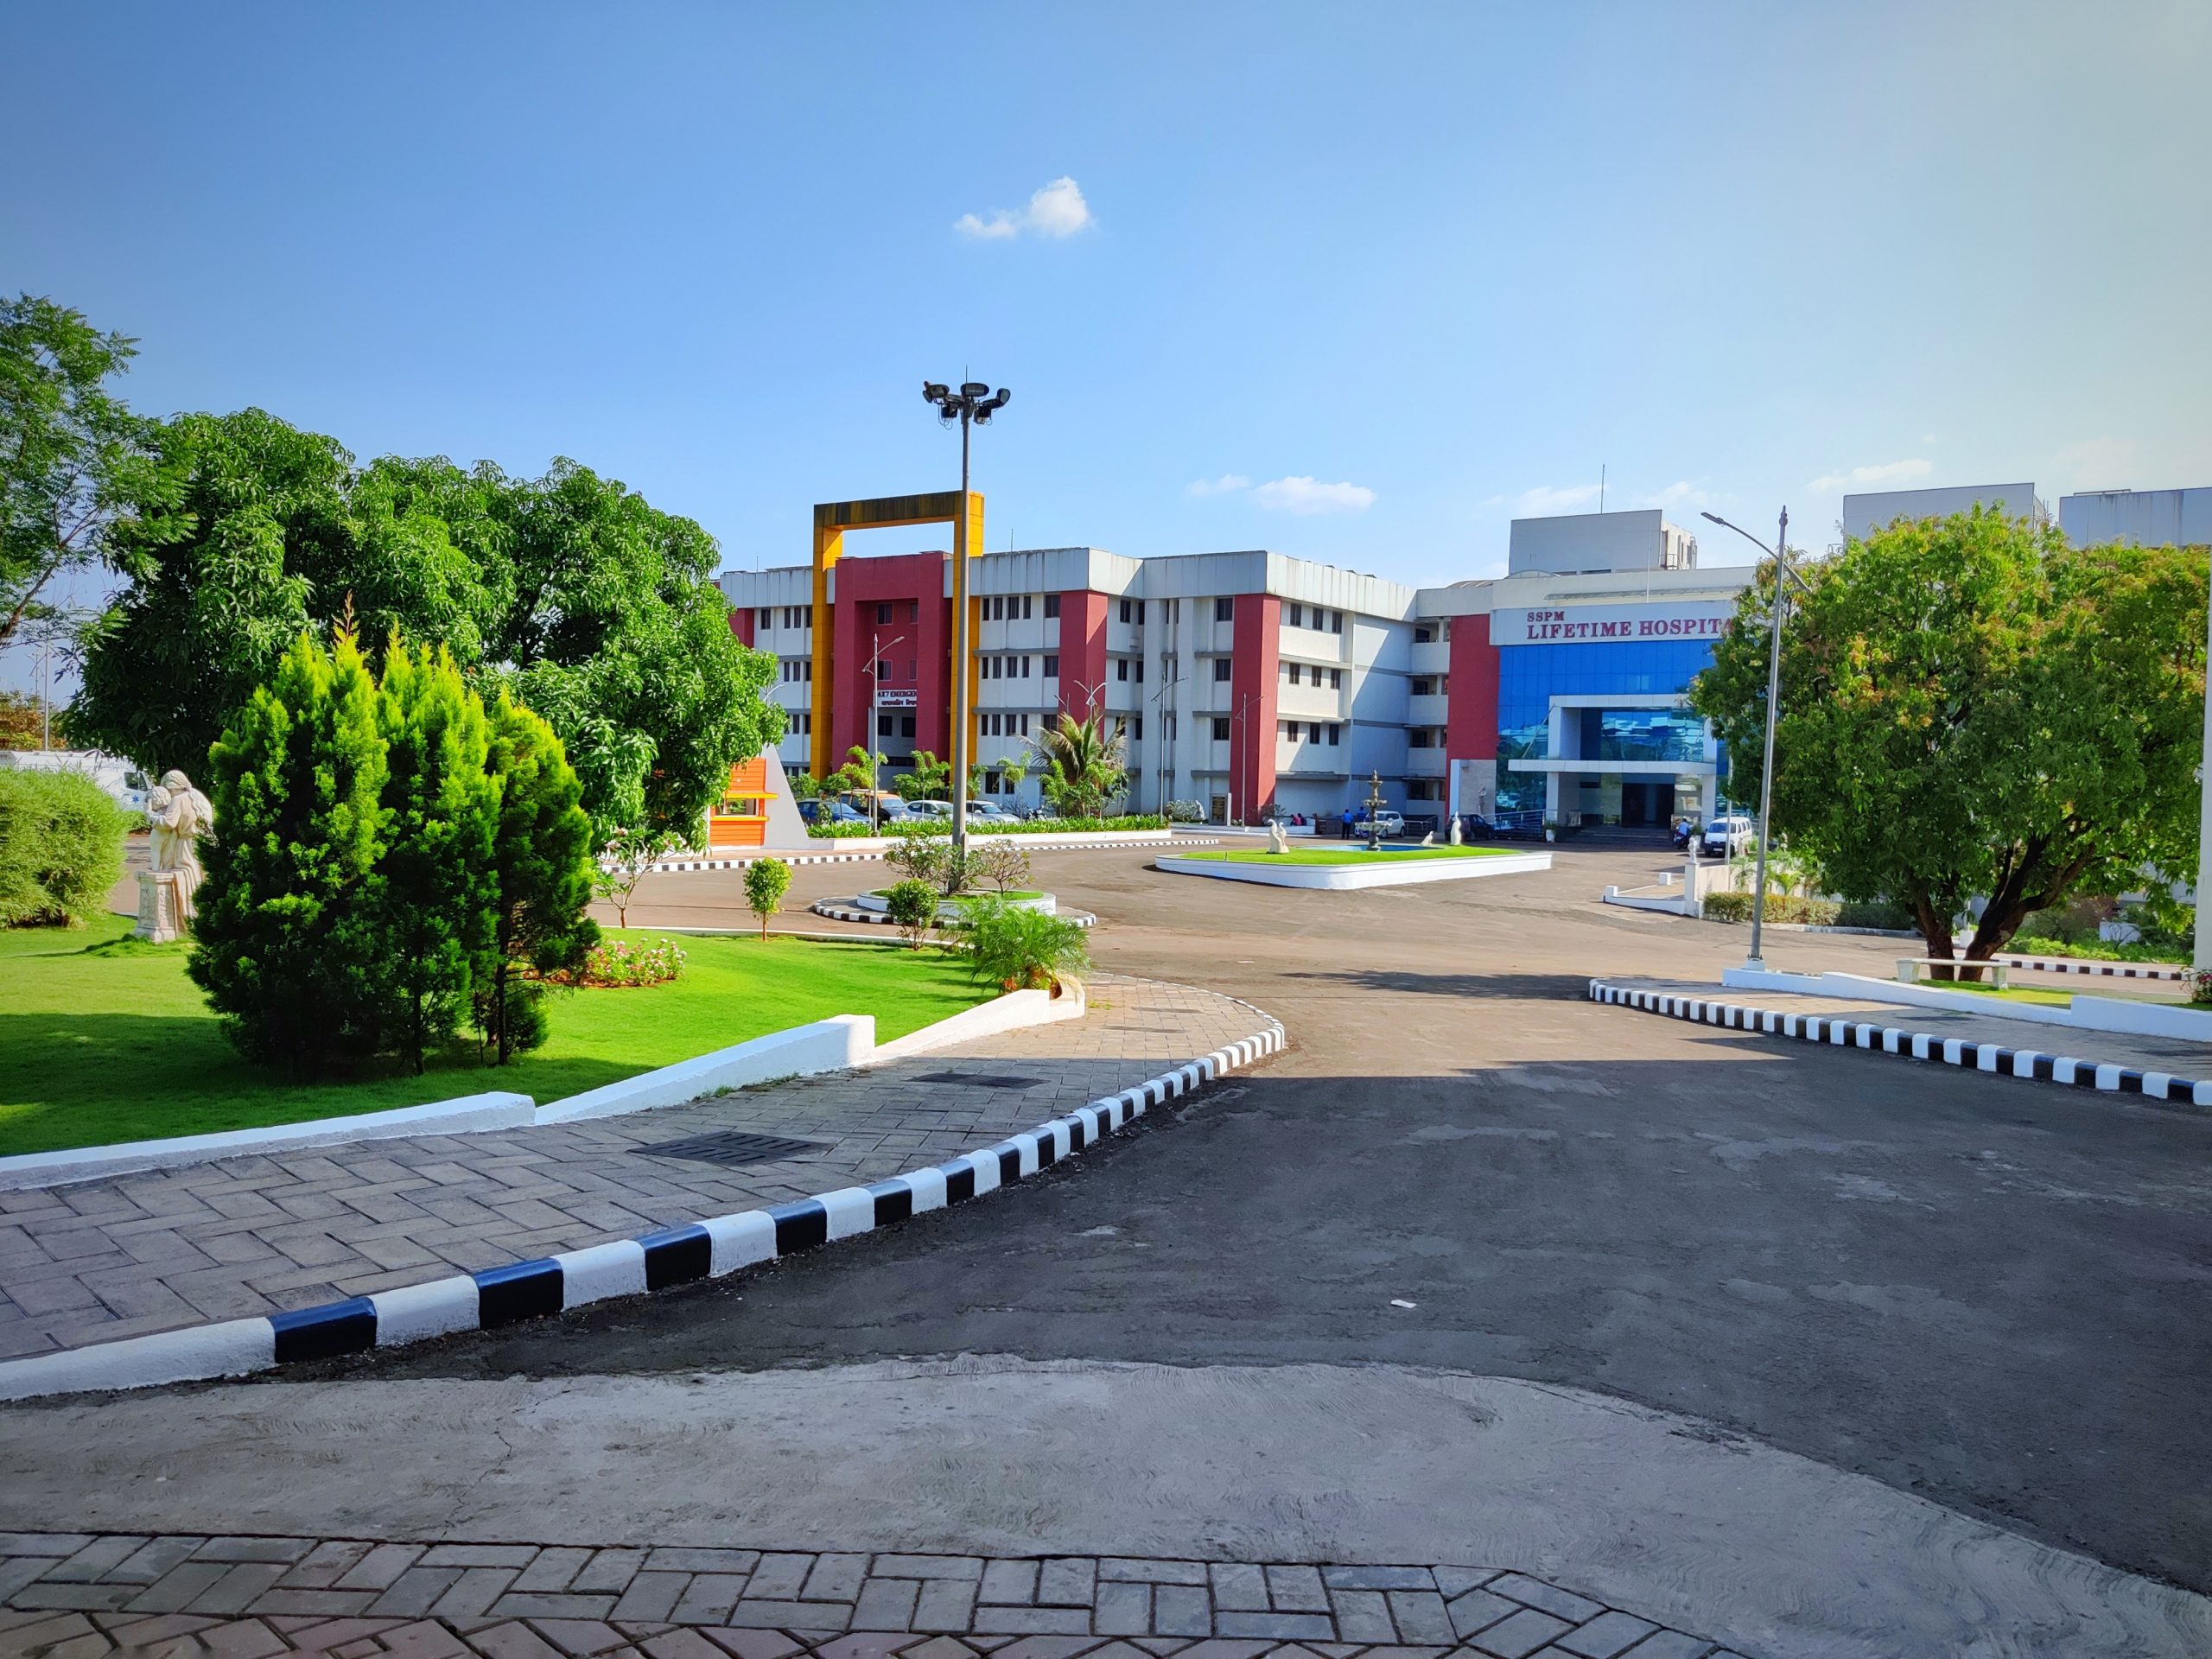 Hospital outside view